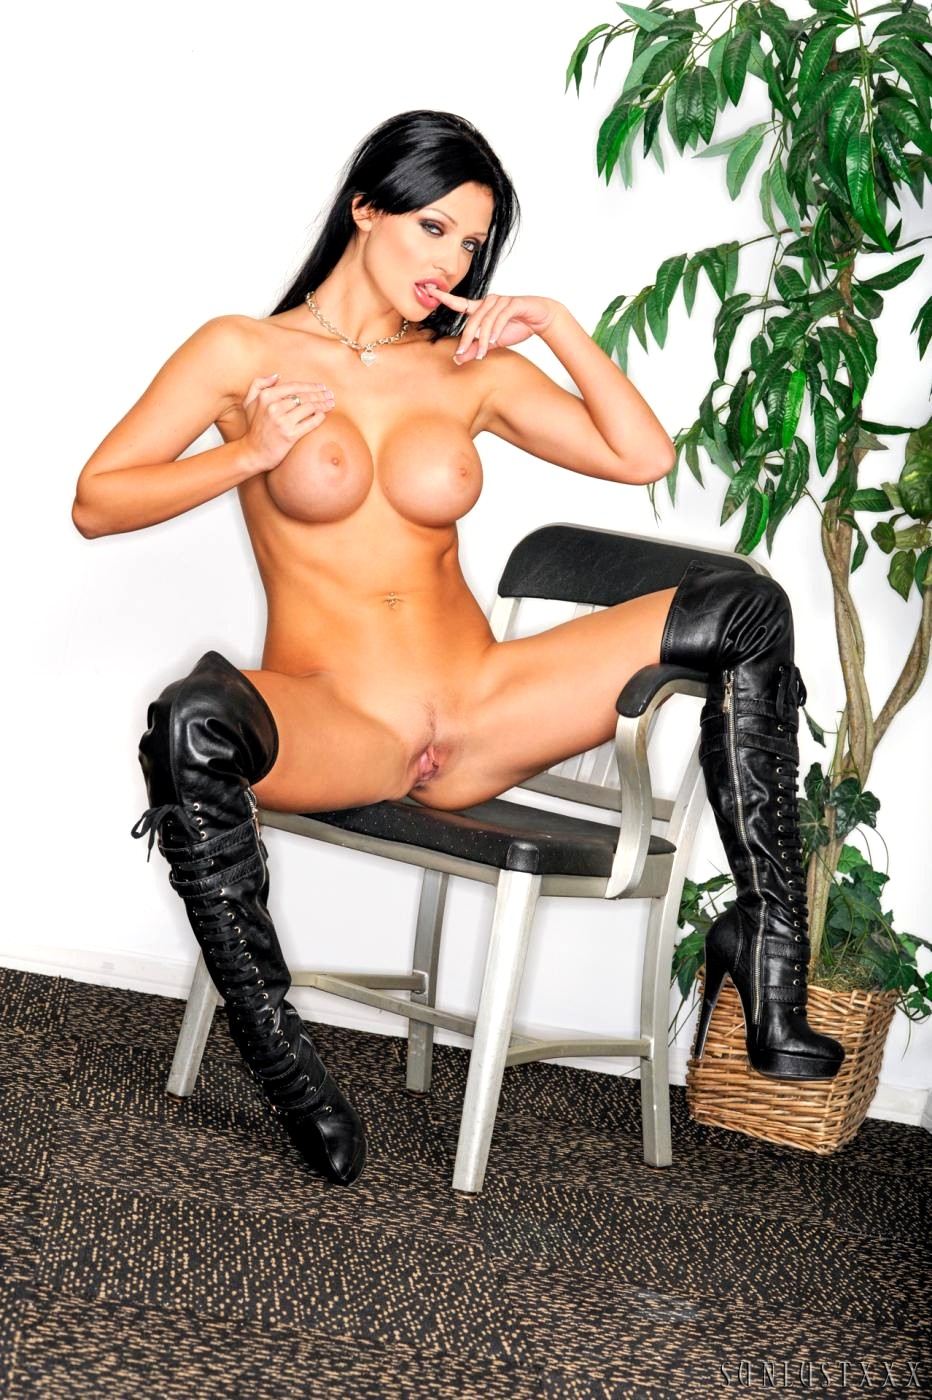 Porn star boots